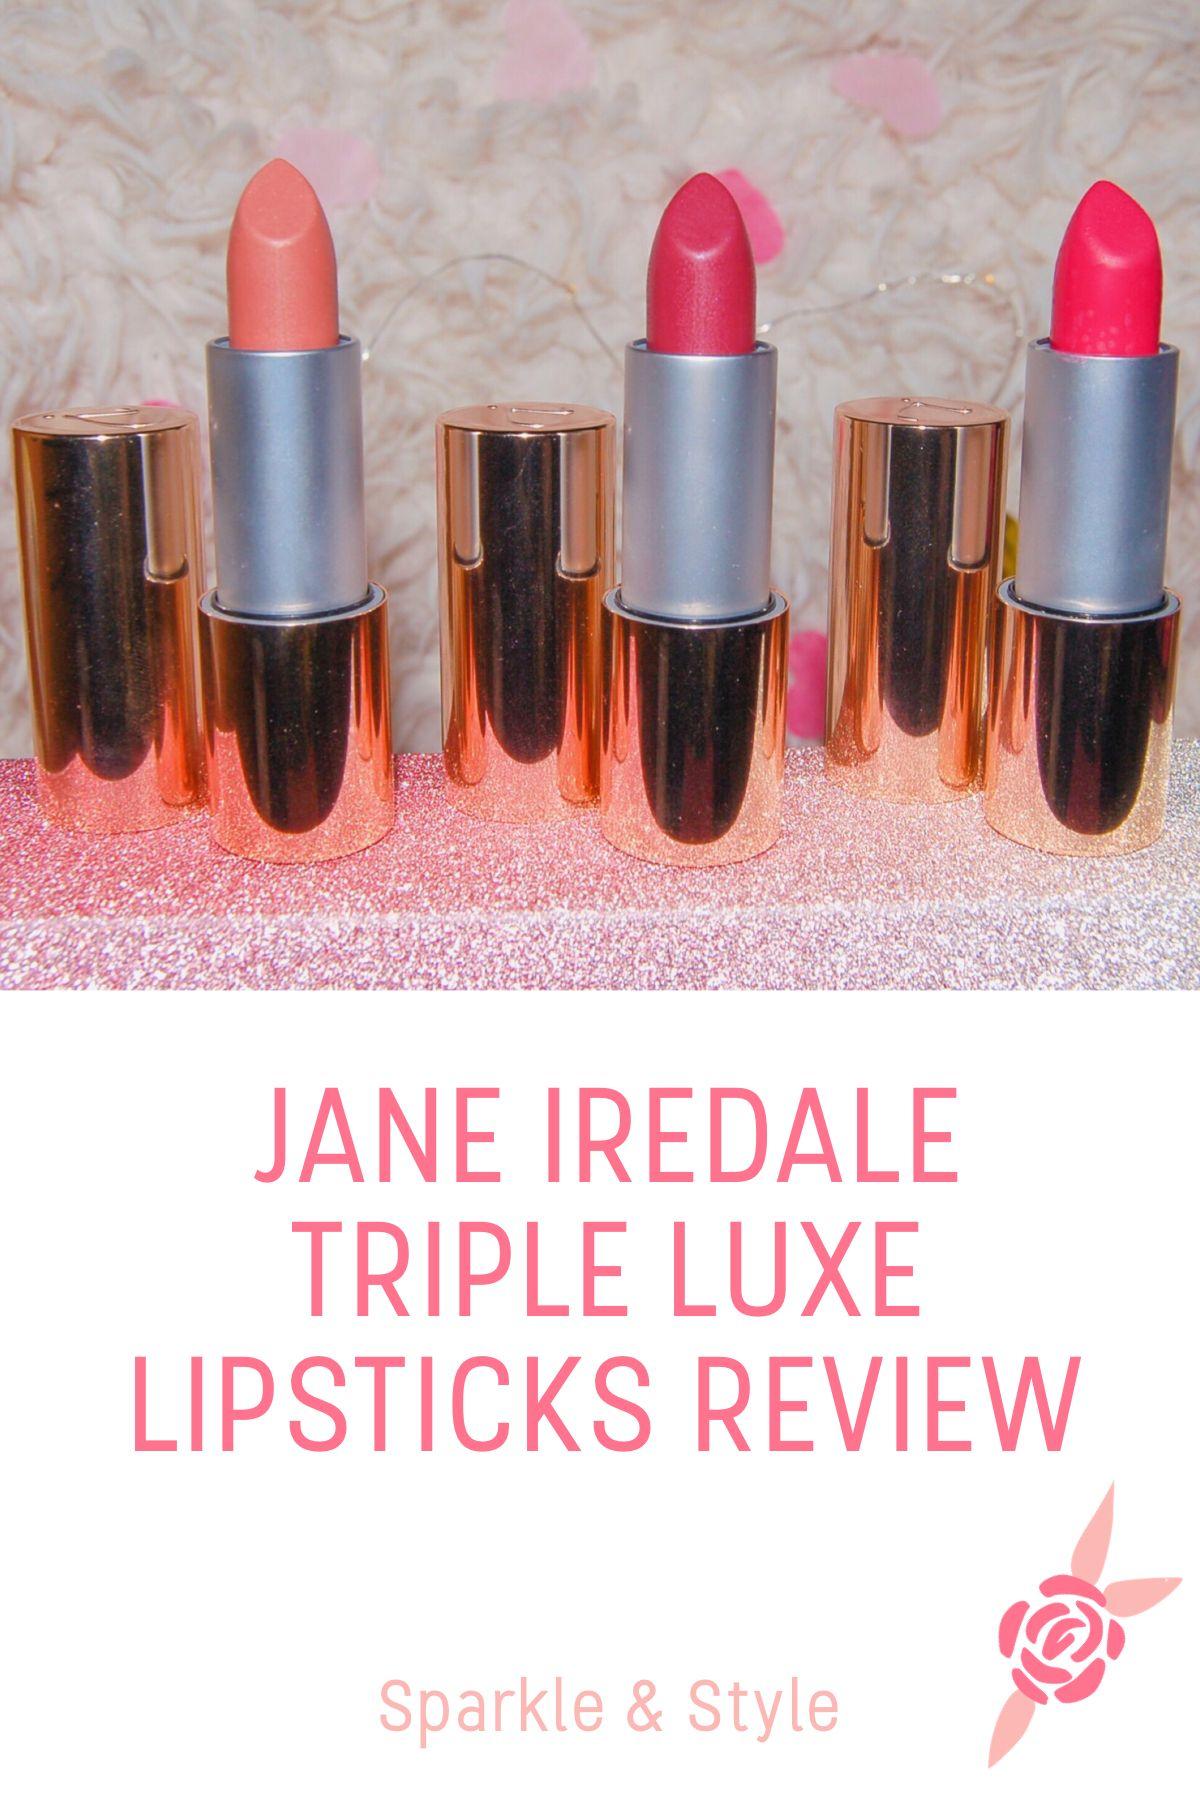 Jane Iredale Triple Luxe Lipsticks Review Lipstick, Blog